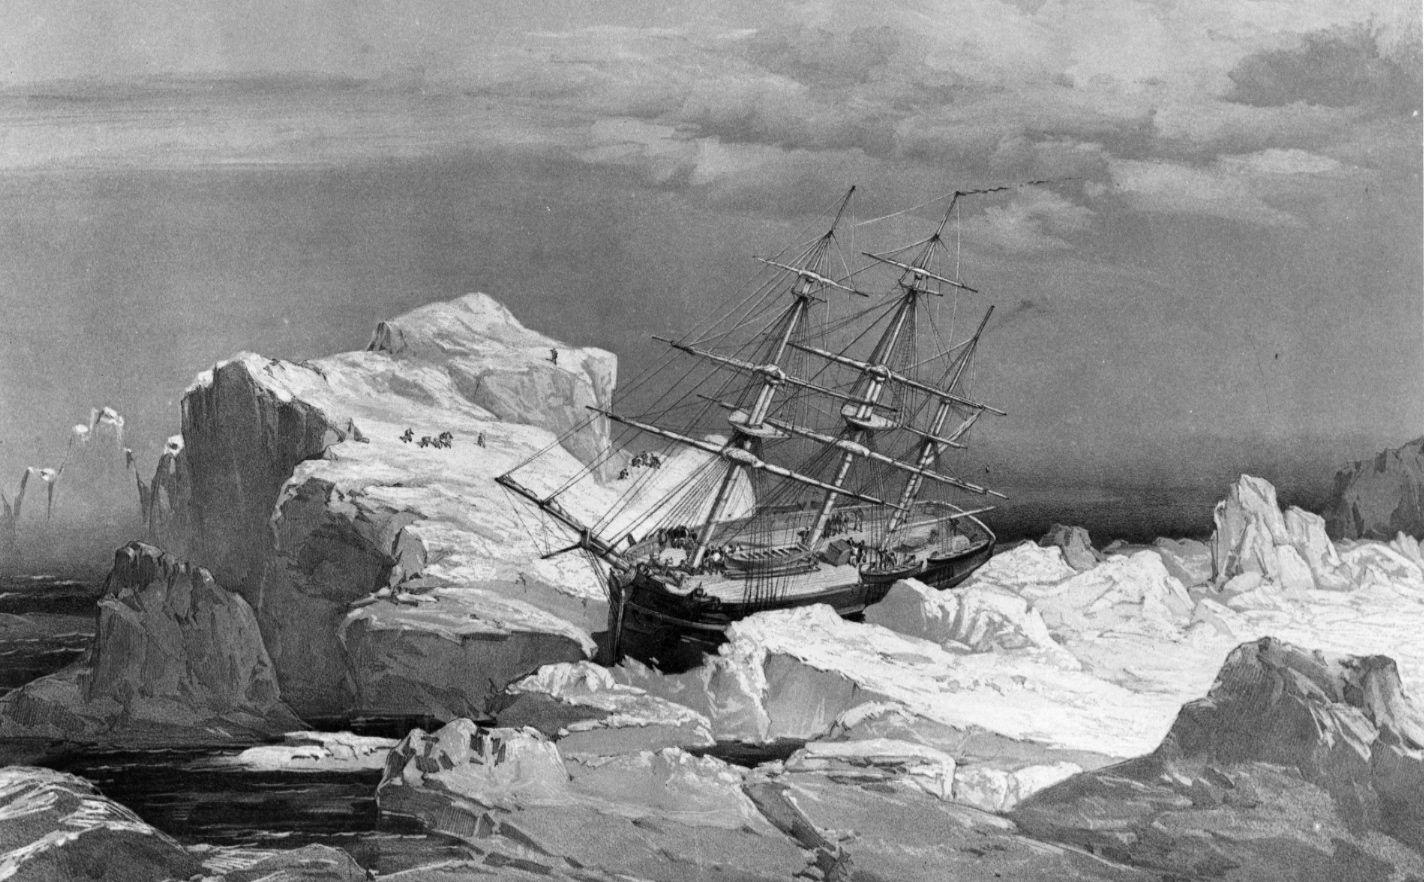 Canada Franklin Ship Found